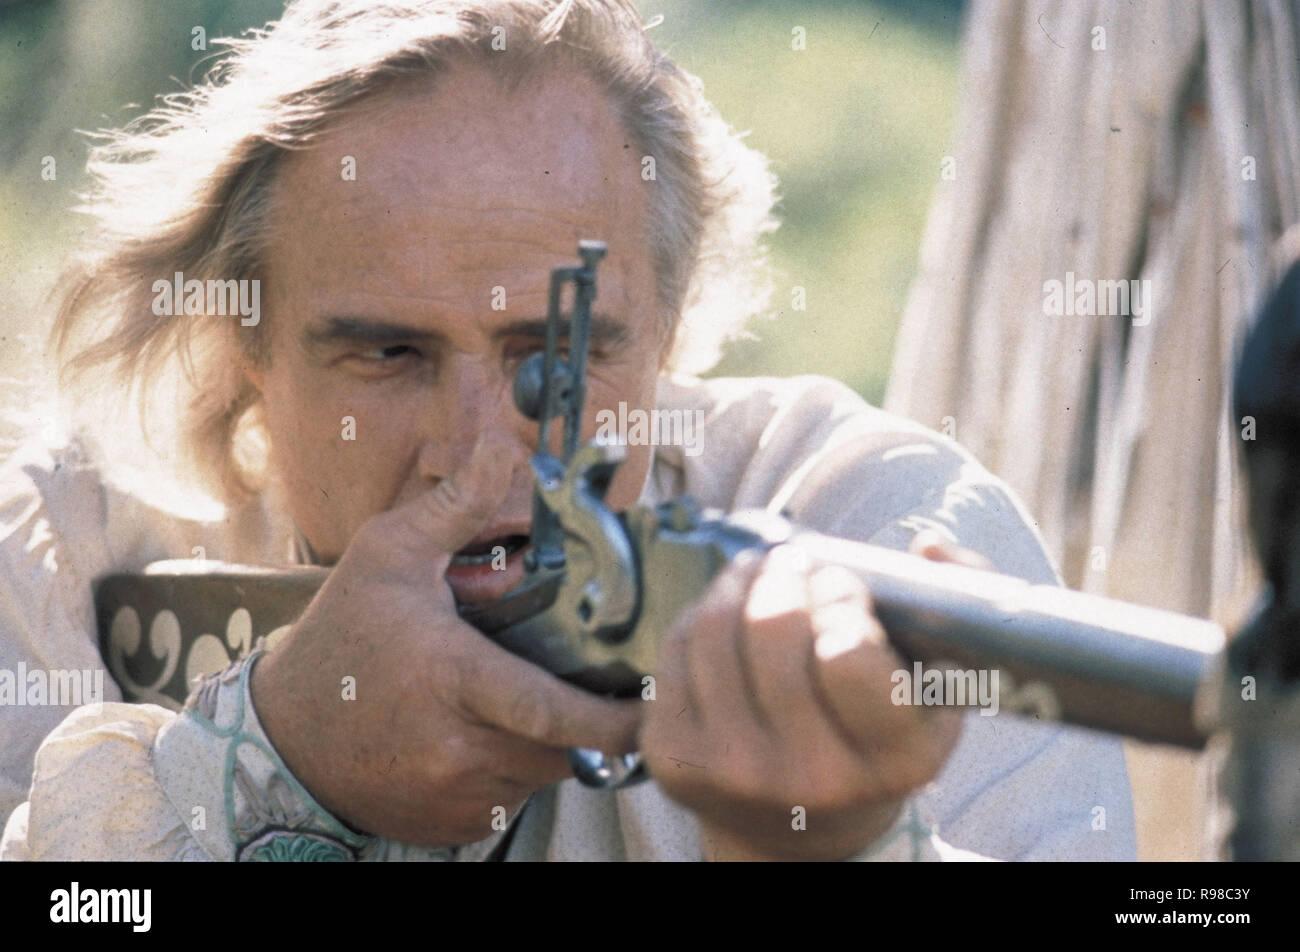 Original film title: THE MISSOURI BREAKS. English title: THE MISSOURI BREAKS. Year: 1976. Director: ARTHUR PENN. Stars: MARLON BRANDO. Credit: UNITED ARTISTS / Album - Stock Image